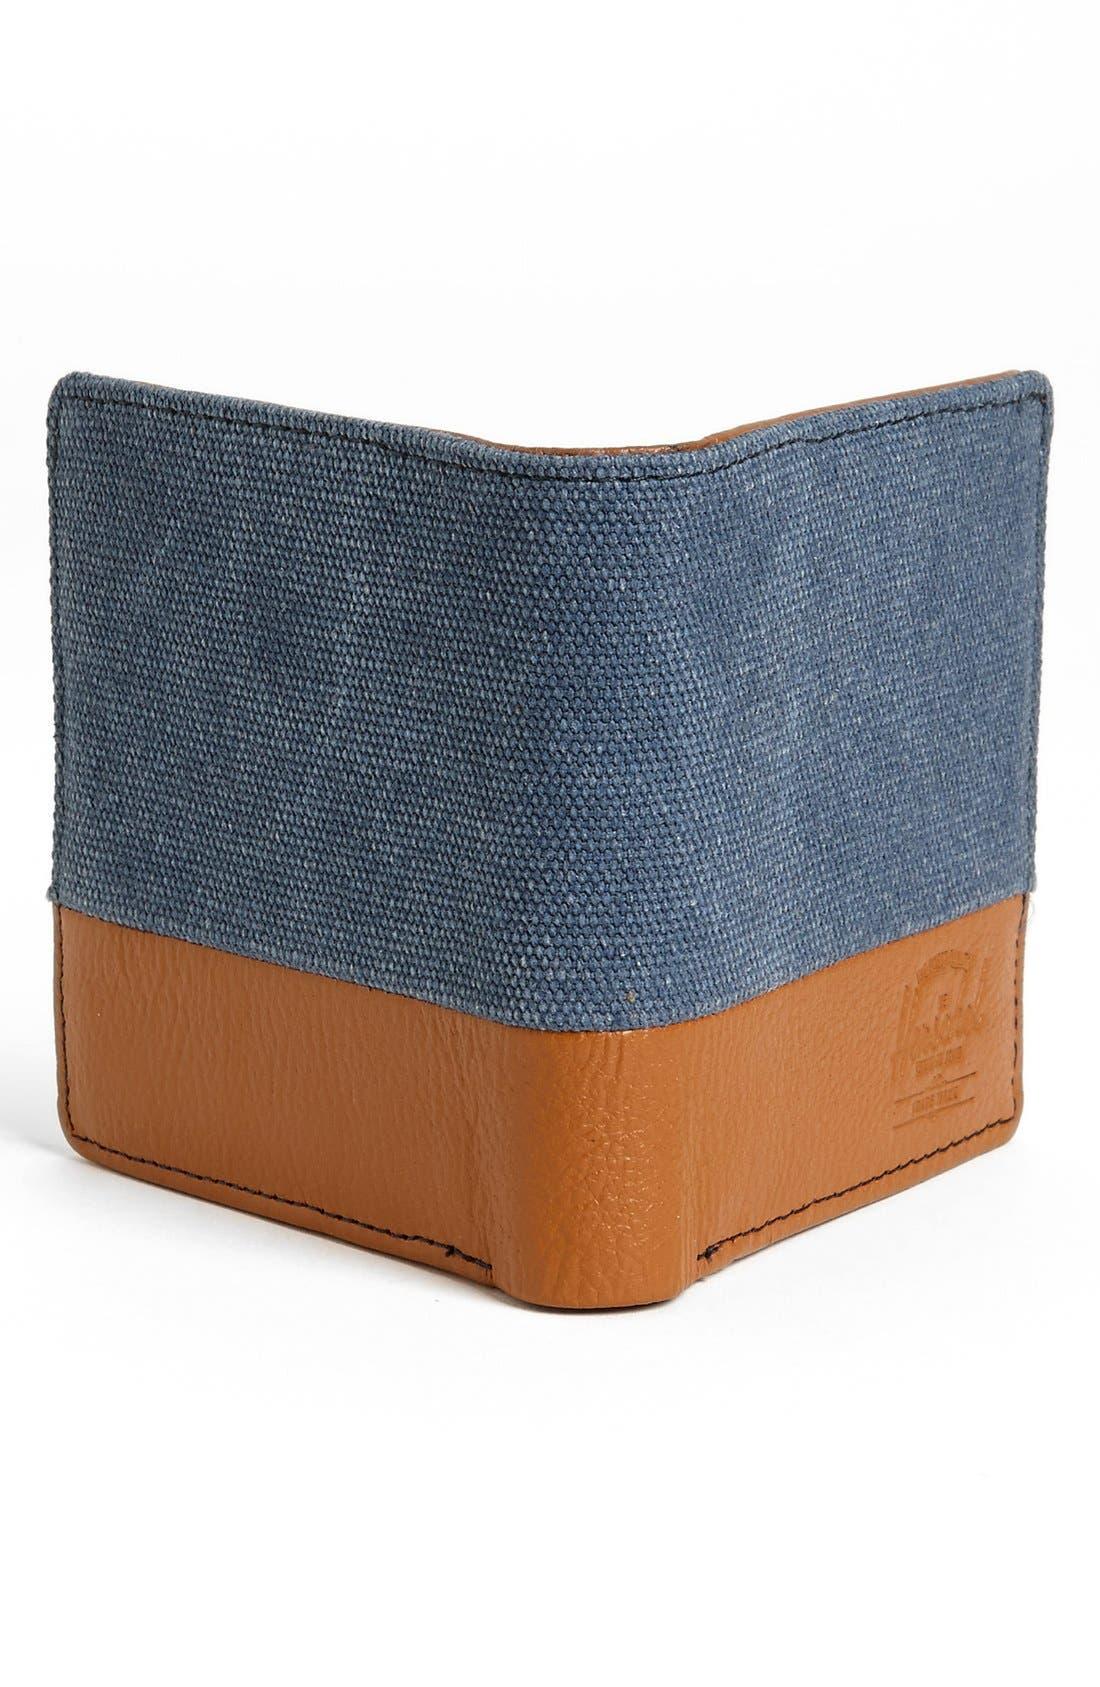 Alternate Image 3  - Herschel Supply Co. 'Kenny' Wallet